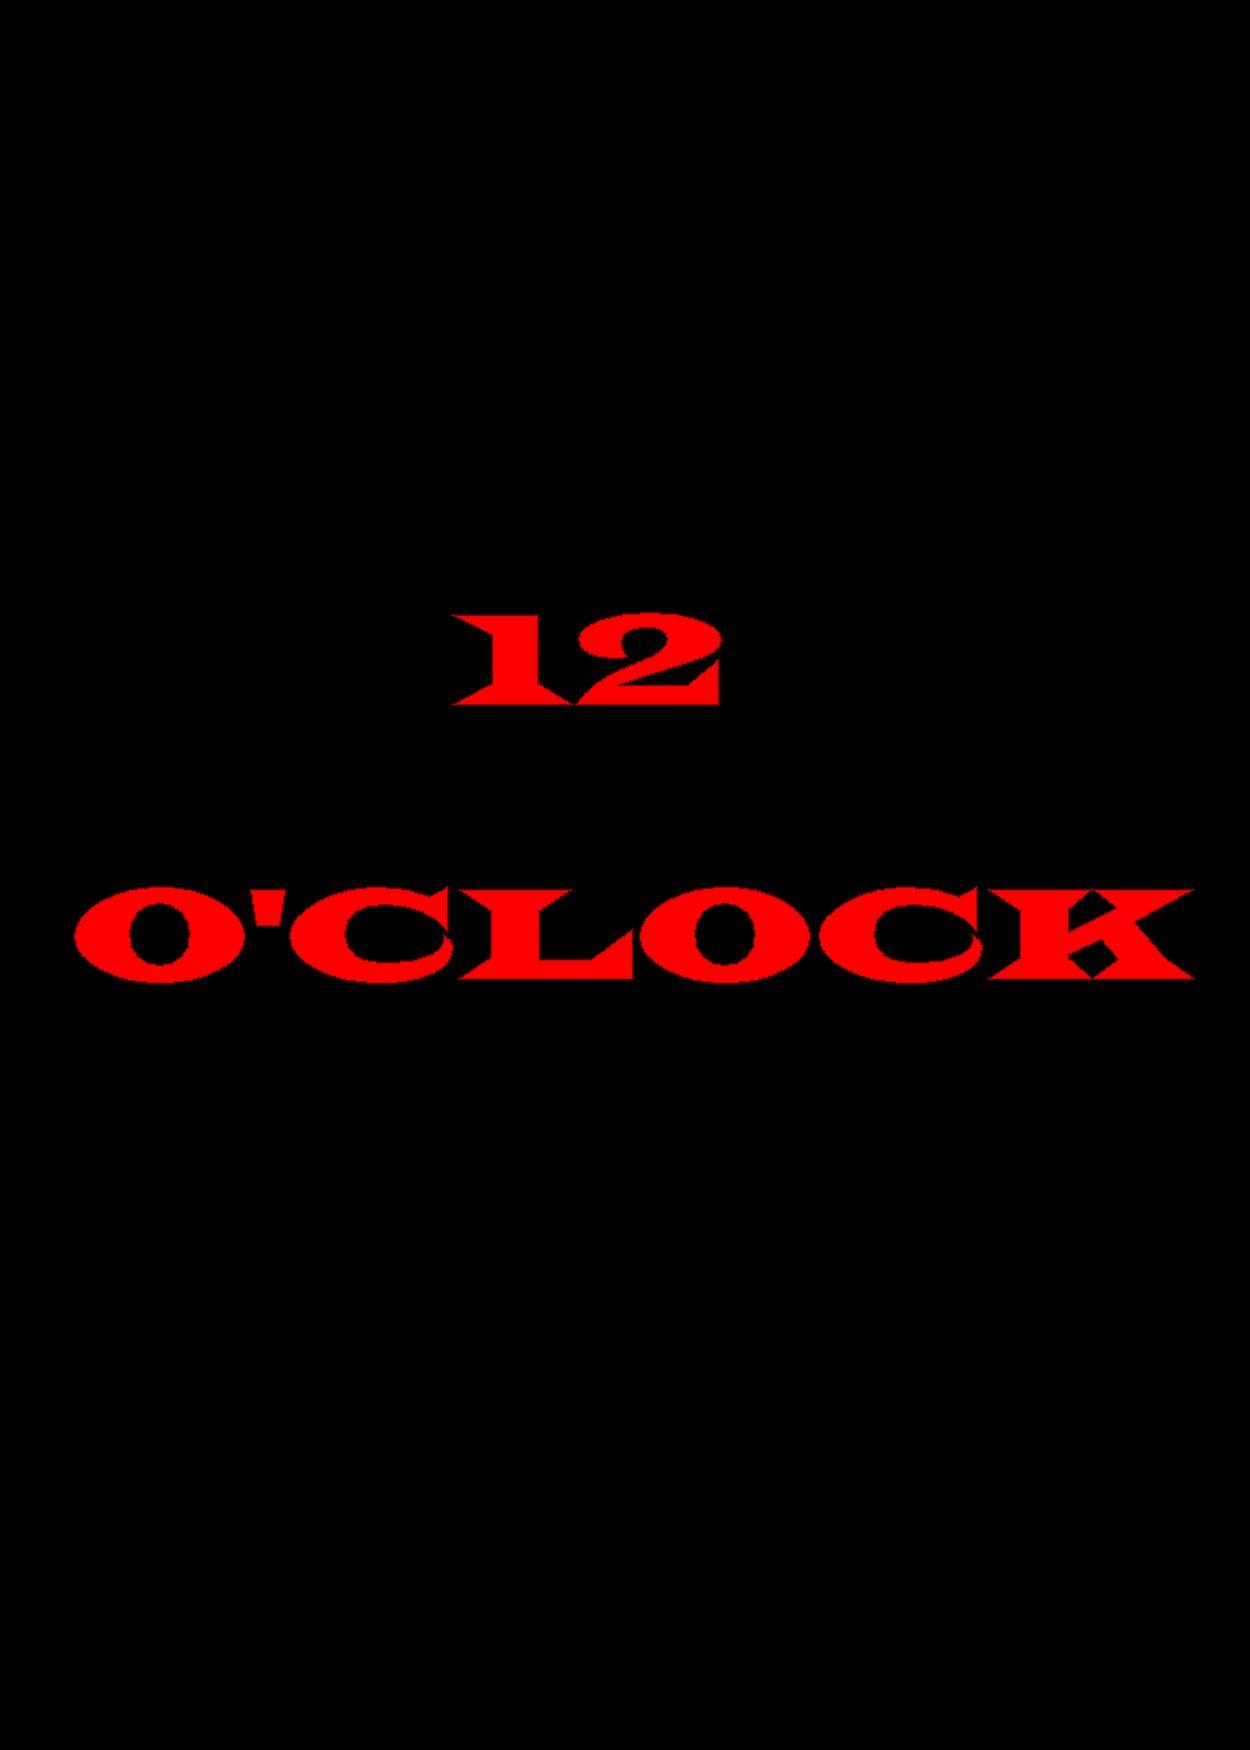 12 O'Clock kapak